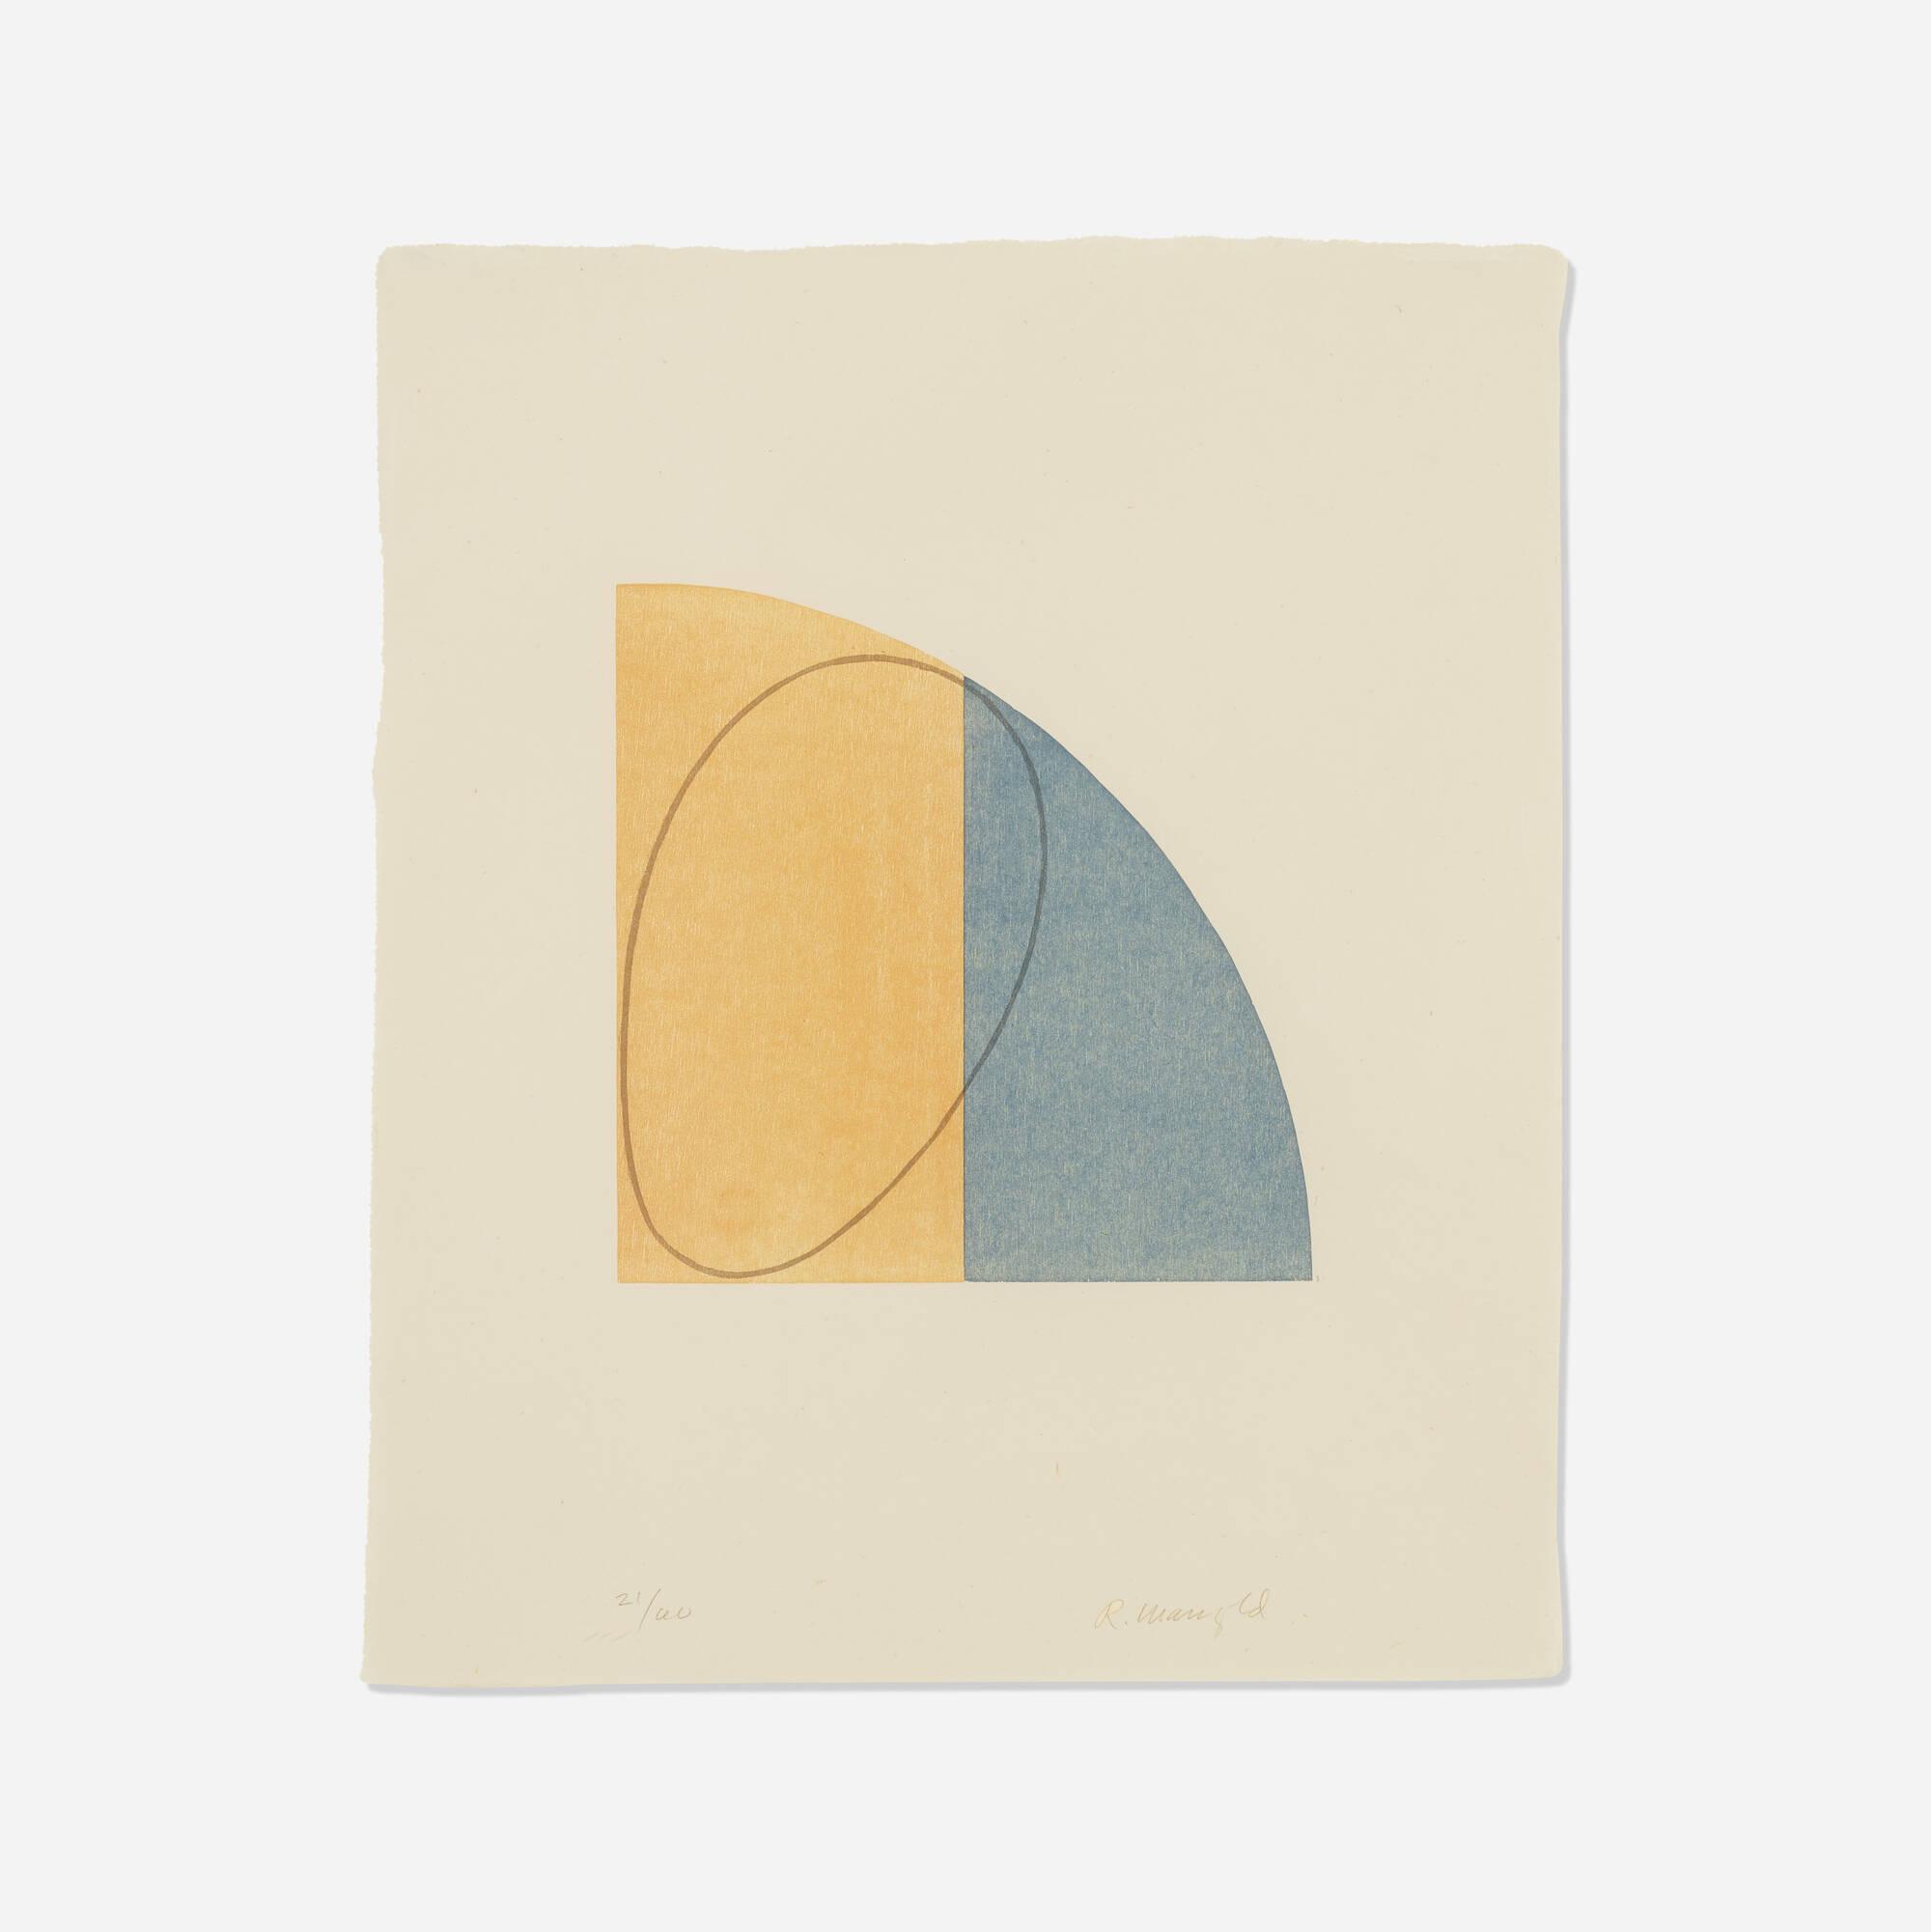 105: Robert Mangold / Curved Plane/Figure II (1 of 1)